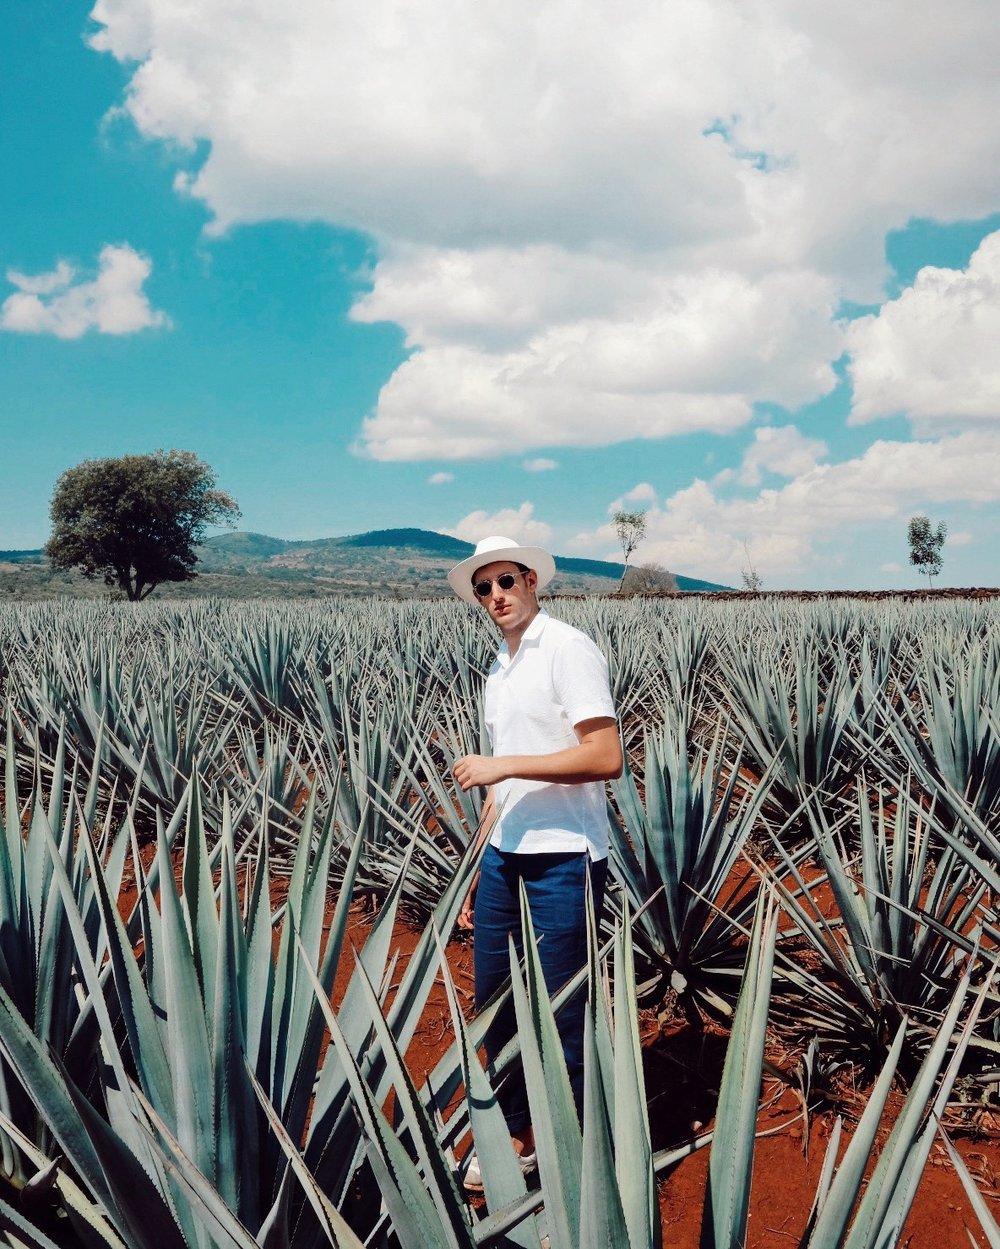 In the agave field wearing Frescobol Carioca